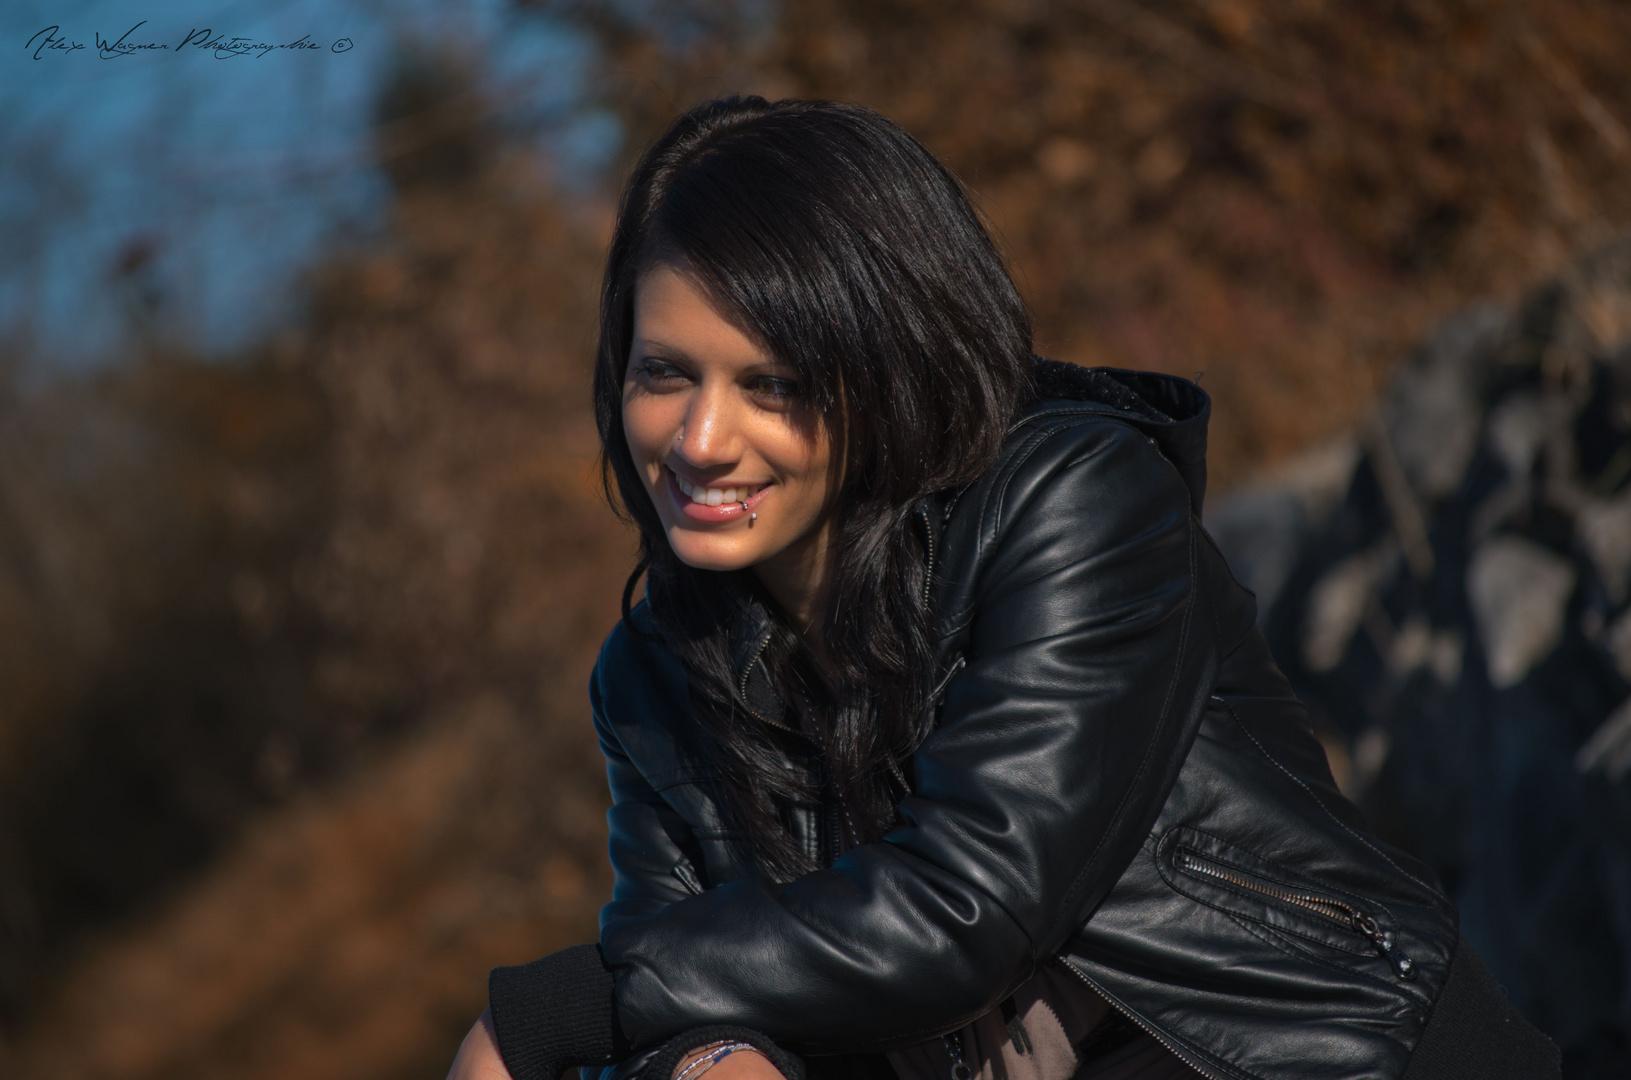 Fotoshooting mit Vero am Forggensee